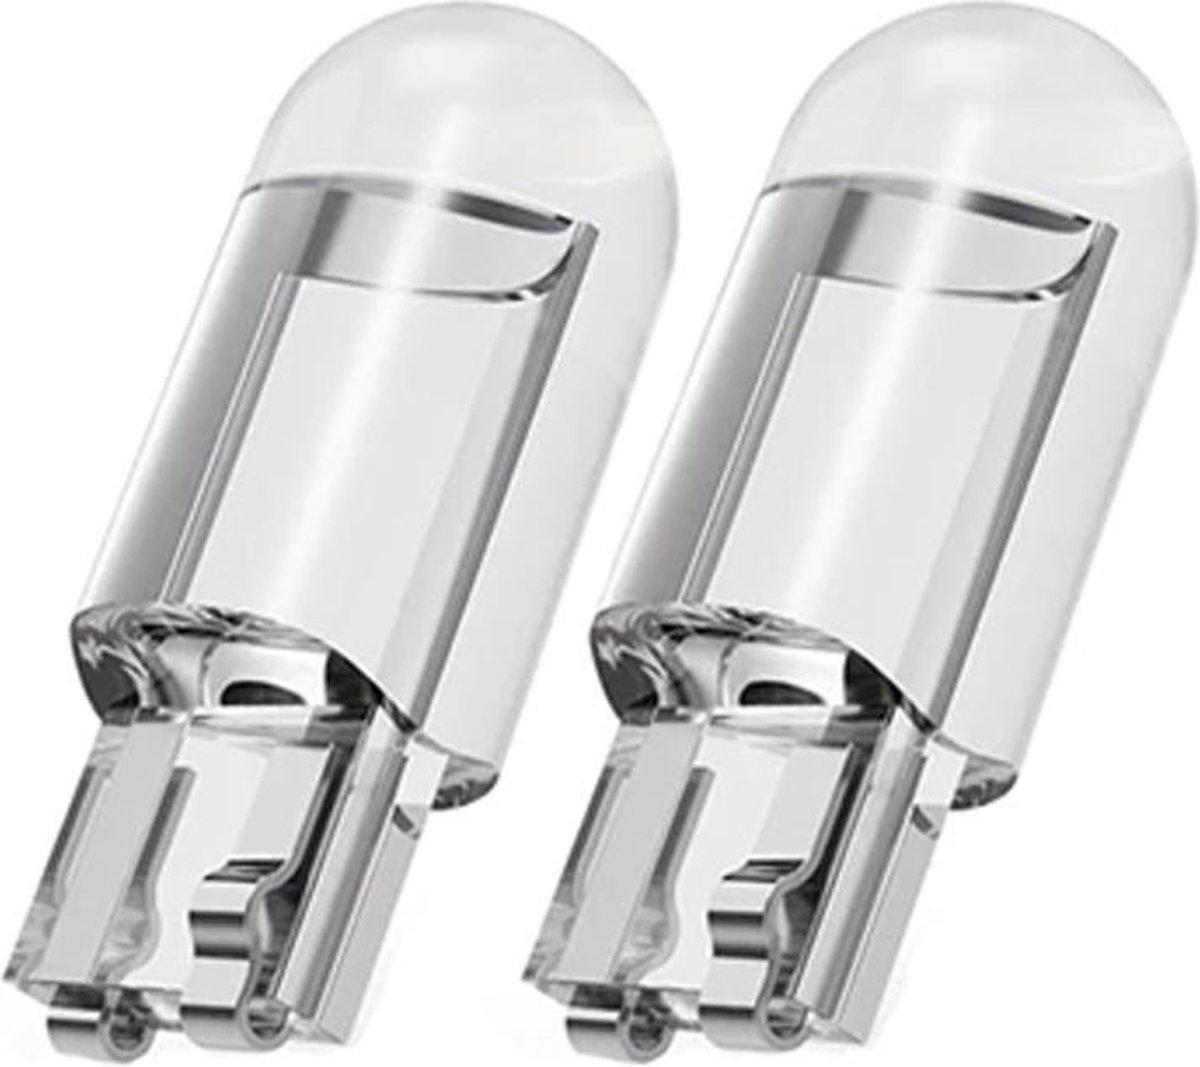 T10 LED-Lamp voor Auto & Motor - Wit - Canbus - 12 Volt - W5W- Set van 2 stuks